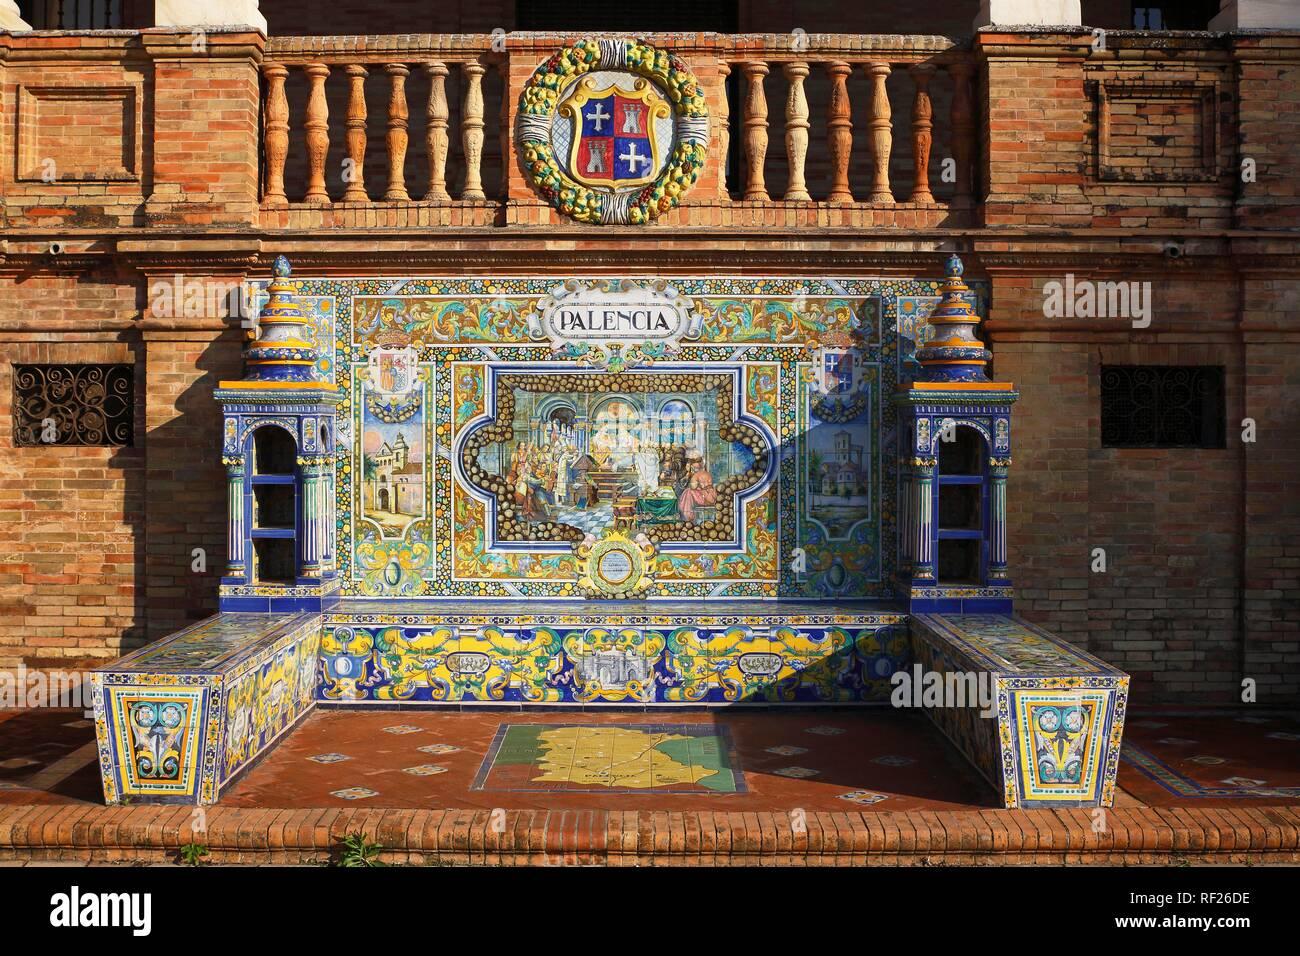 Mosaic picture of the province Palencia from Azulejo tiles, Plaza de España, Sevilla, Andalusia, Spain - Stock Image